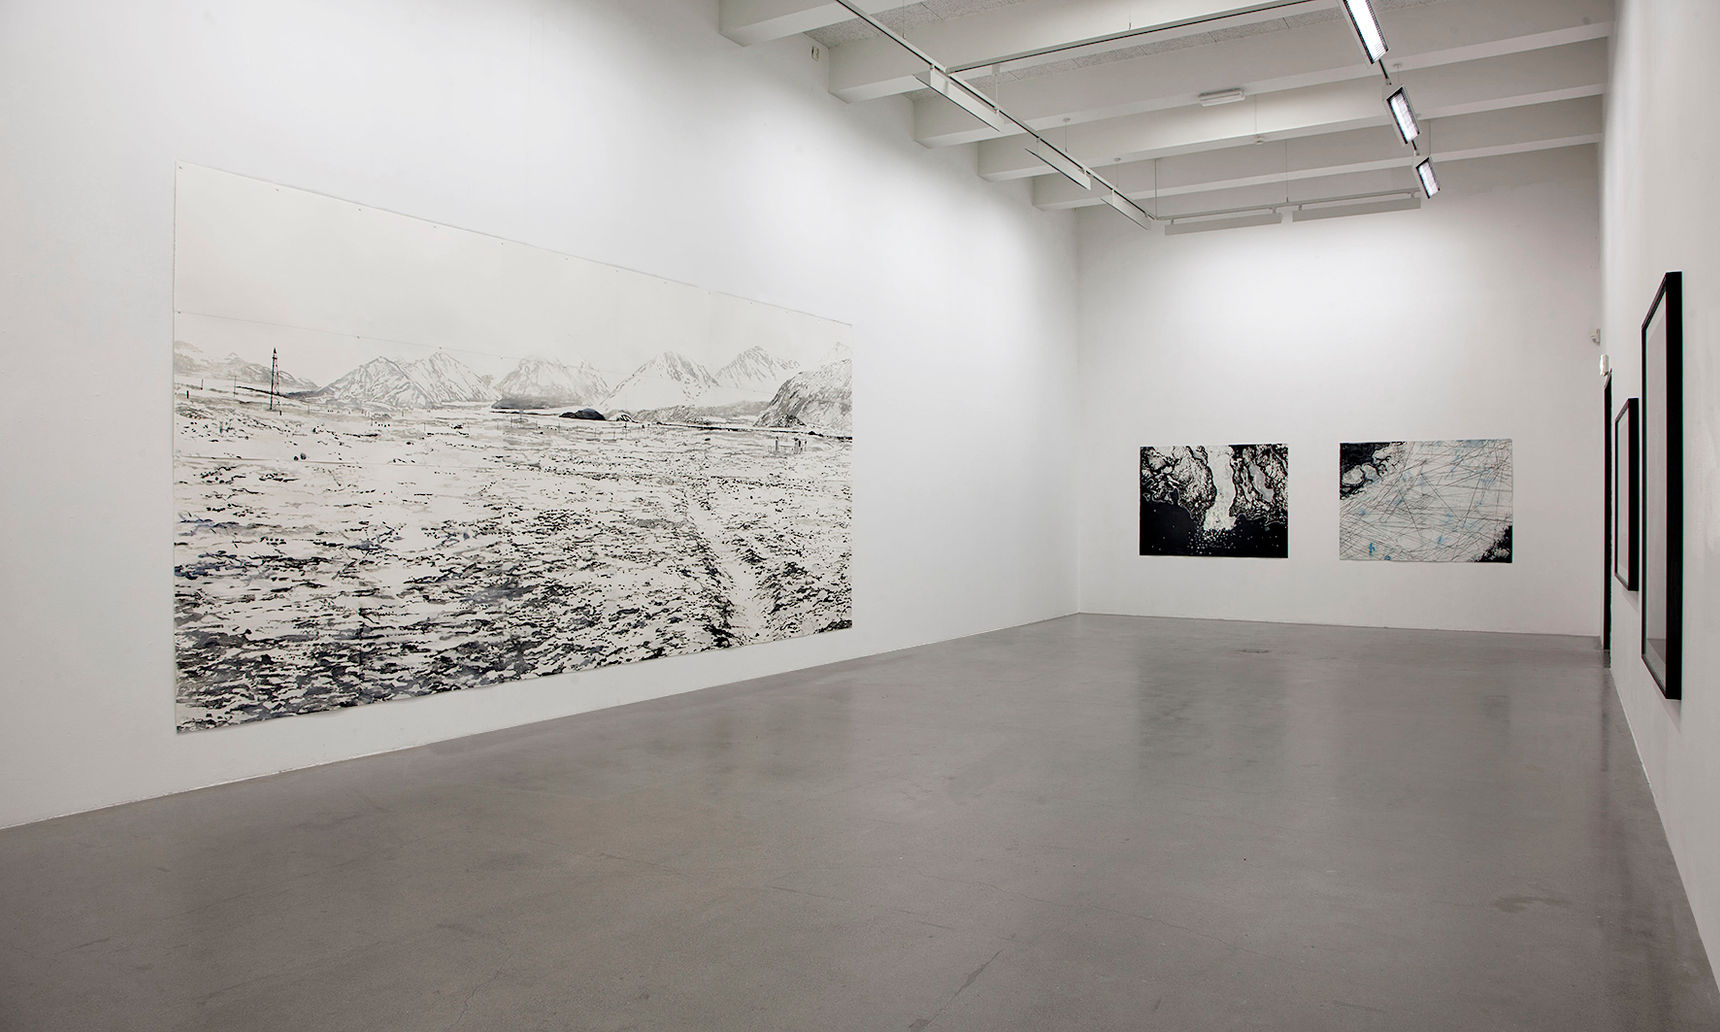 78°55′N 11°56′E in Trafo Kunsthall. Photo: Jens Hamran